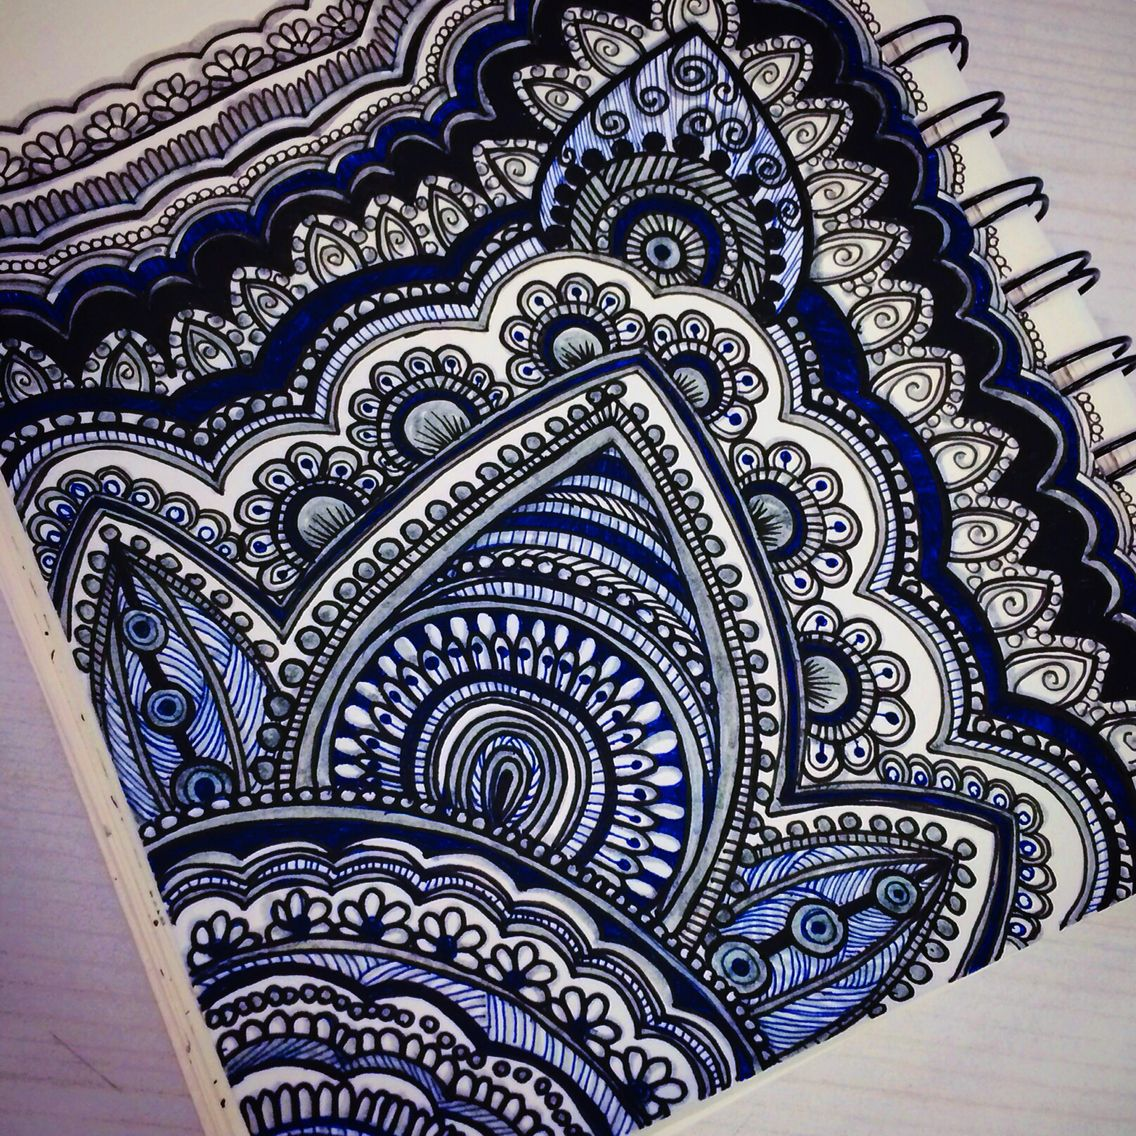 Mandala X Henna On Paper Henna Drawings Henna Designs Paper